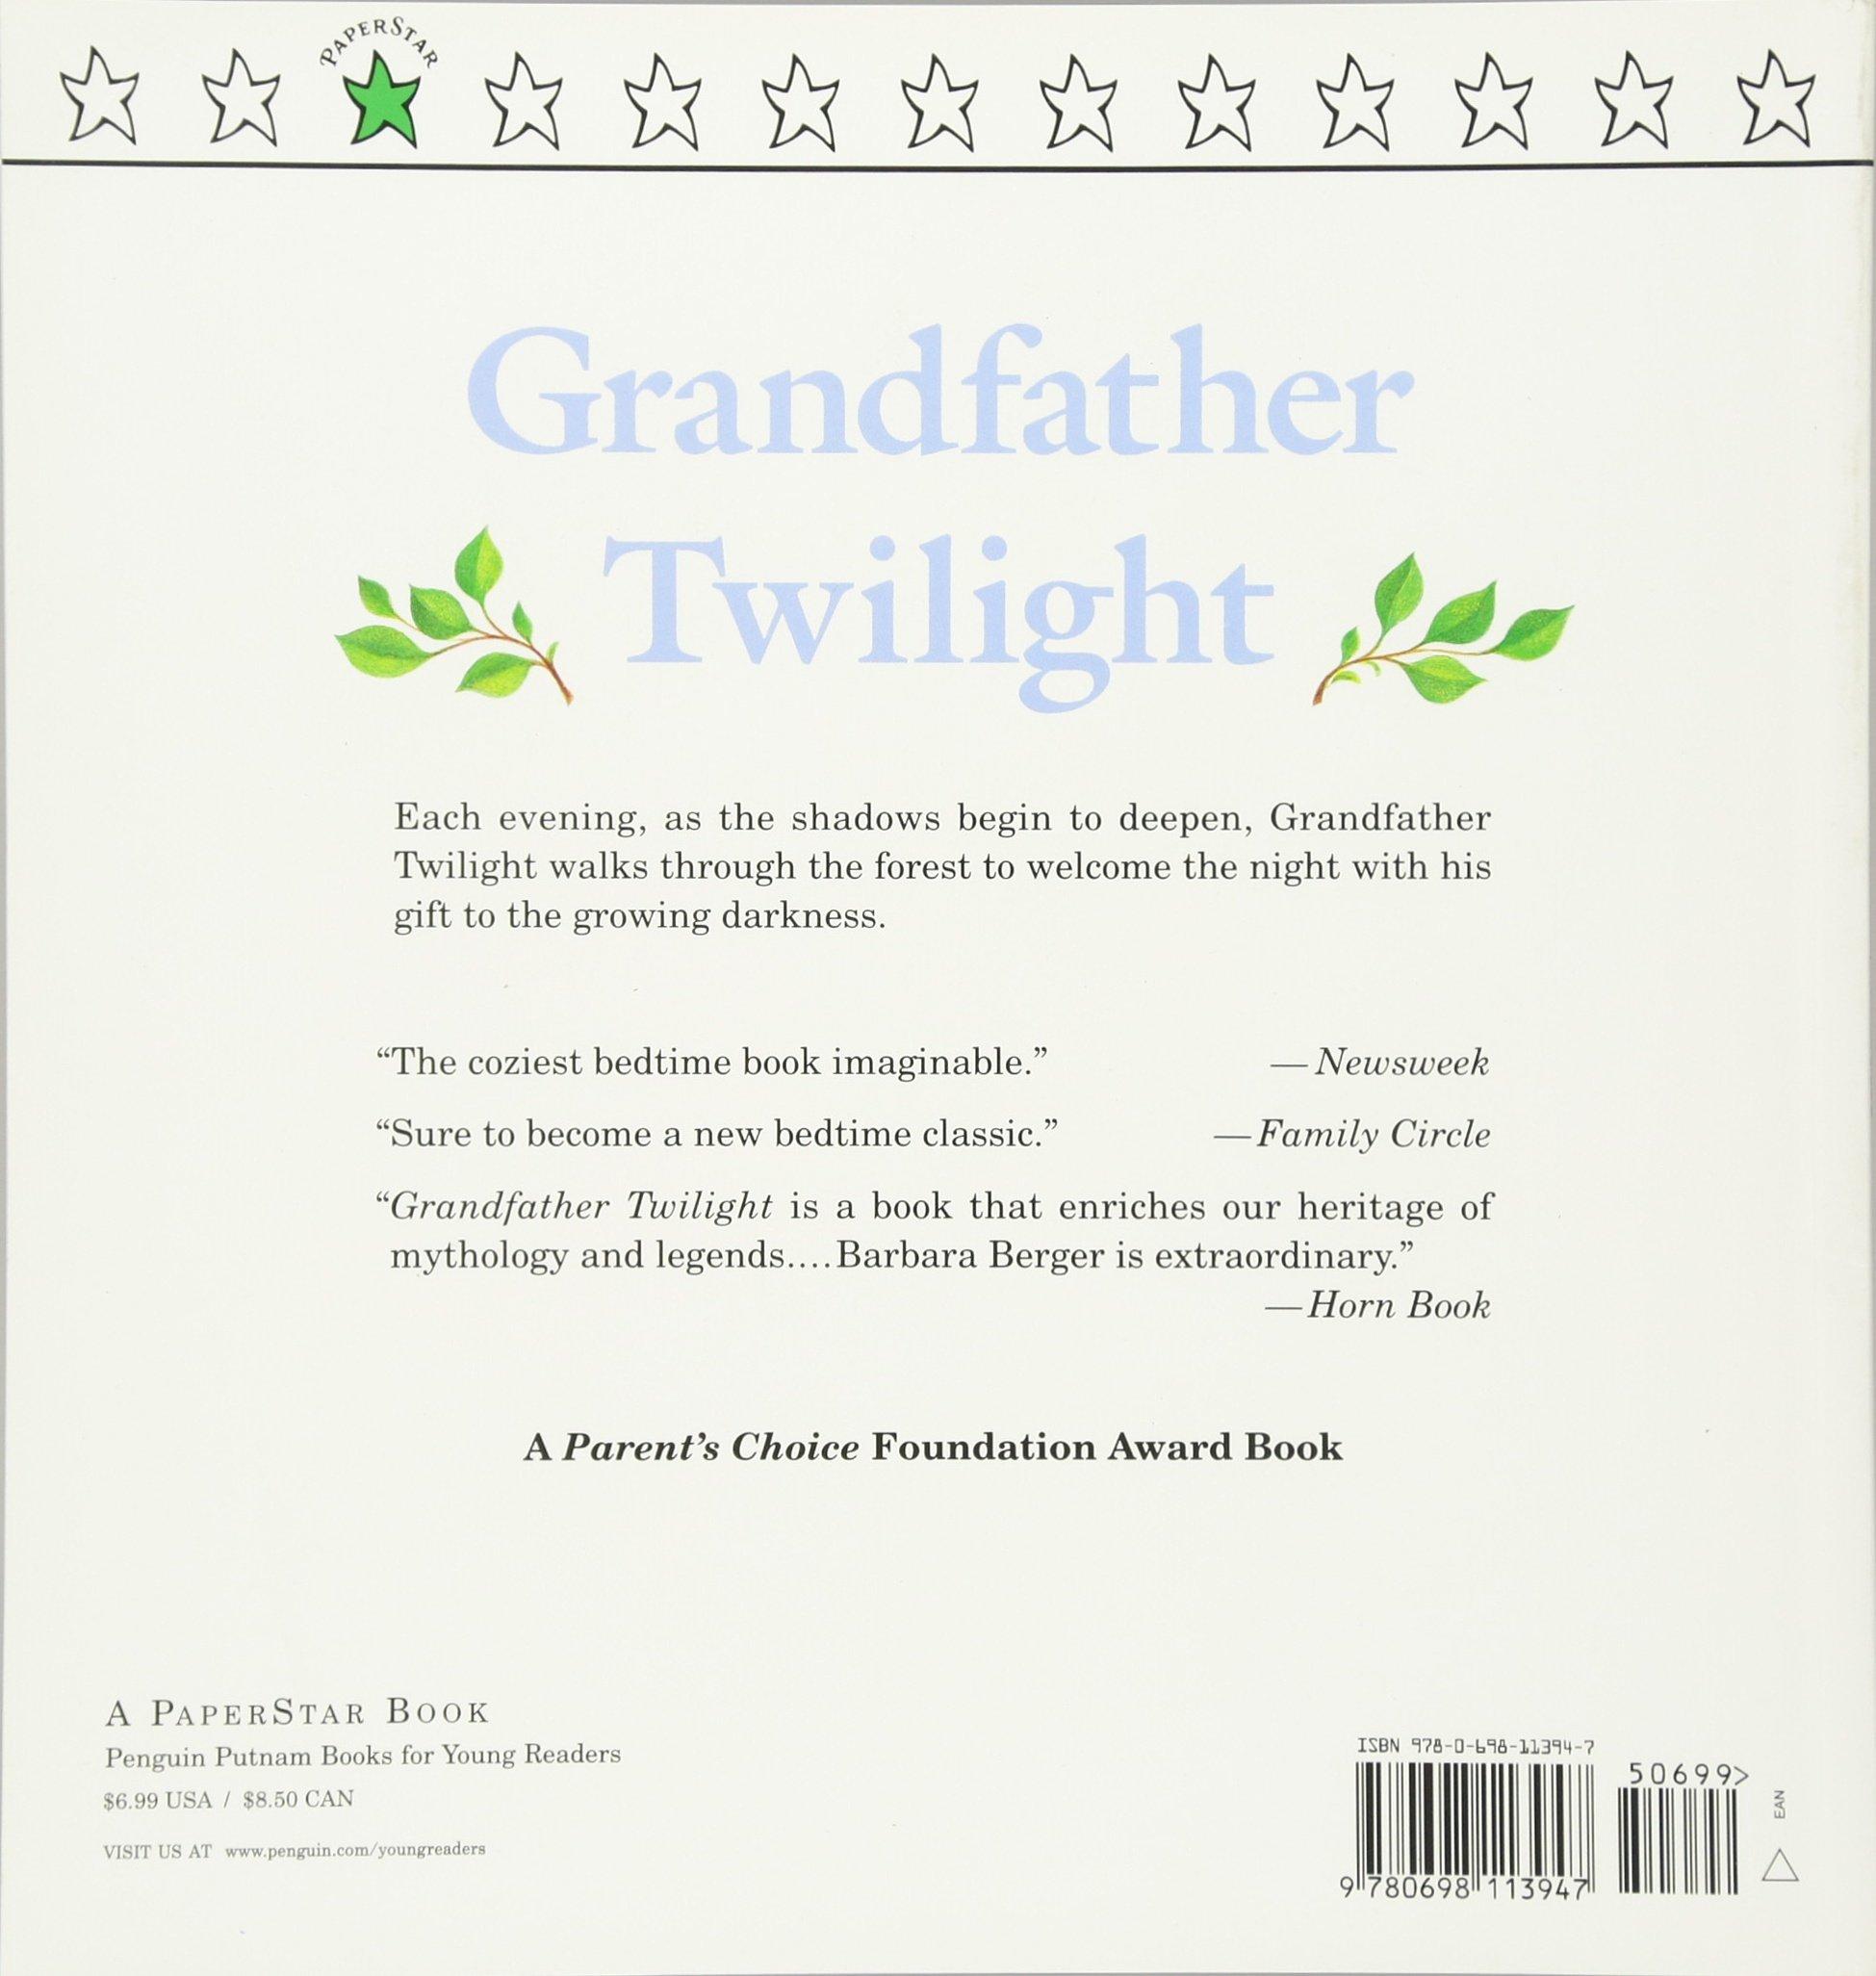 Grandfather Twilight (paperstar Book): Barbara Helen Berger: 9780698113947:  Amazon: Books